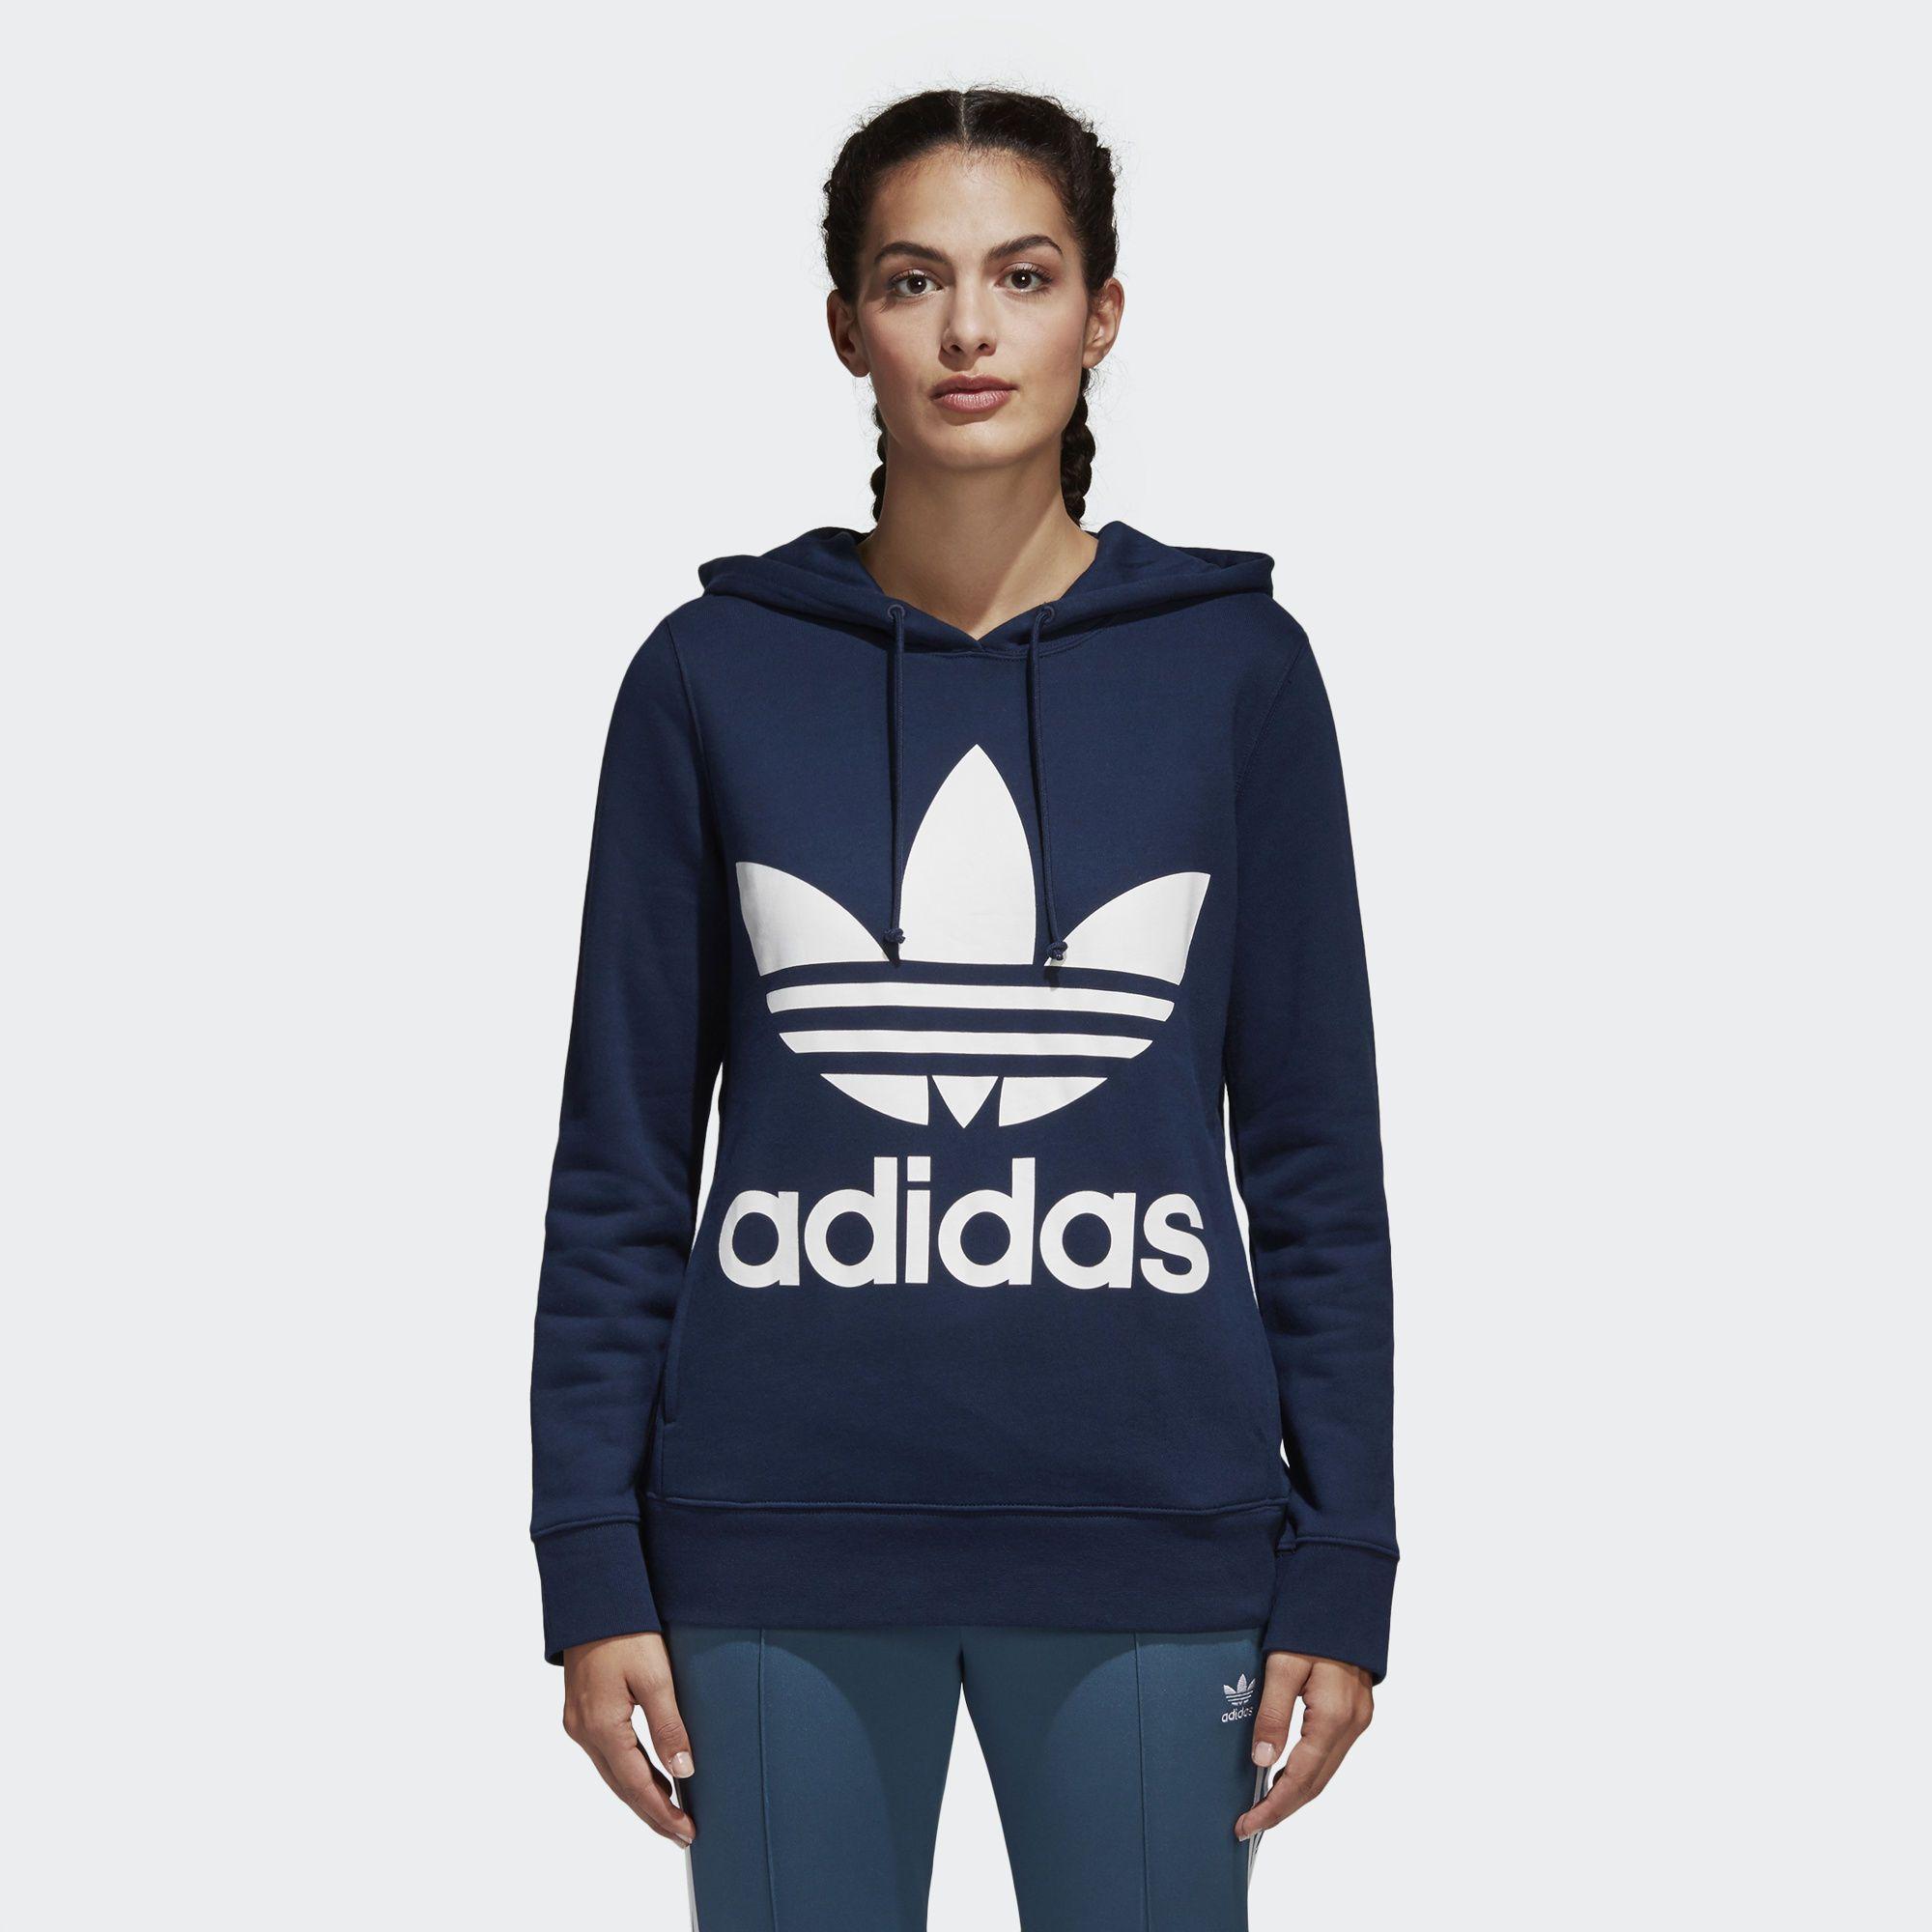 Adidas Trefoil Hoodie Blue Adidas Us Shirt Outfit Women Adidas Trefoil Hoodie Adidas Women Fashion [ 2000 x 2000 Pixel ]